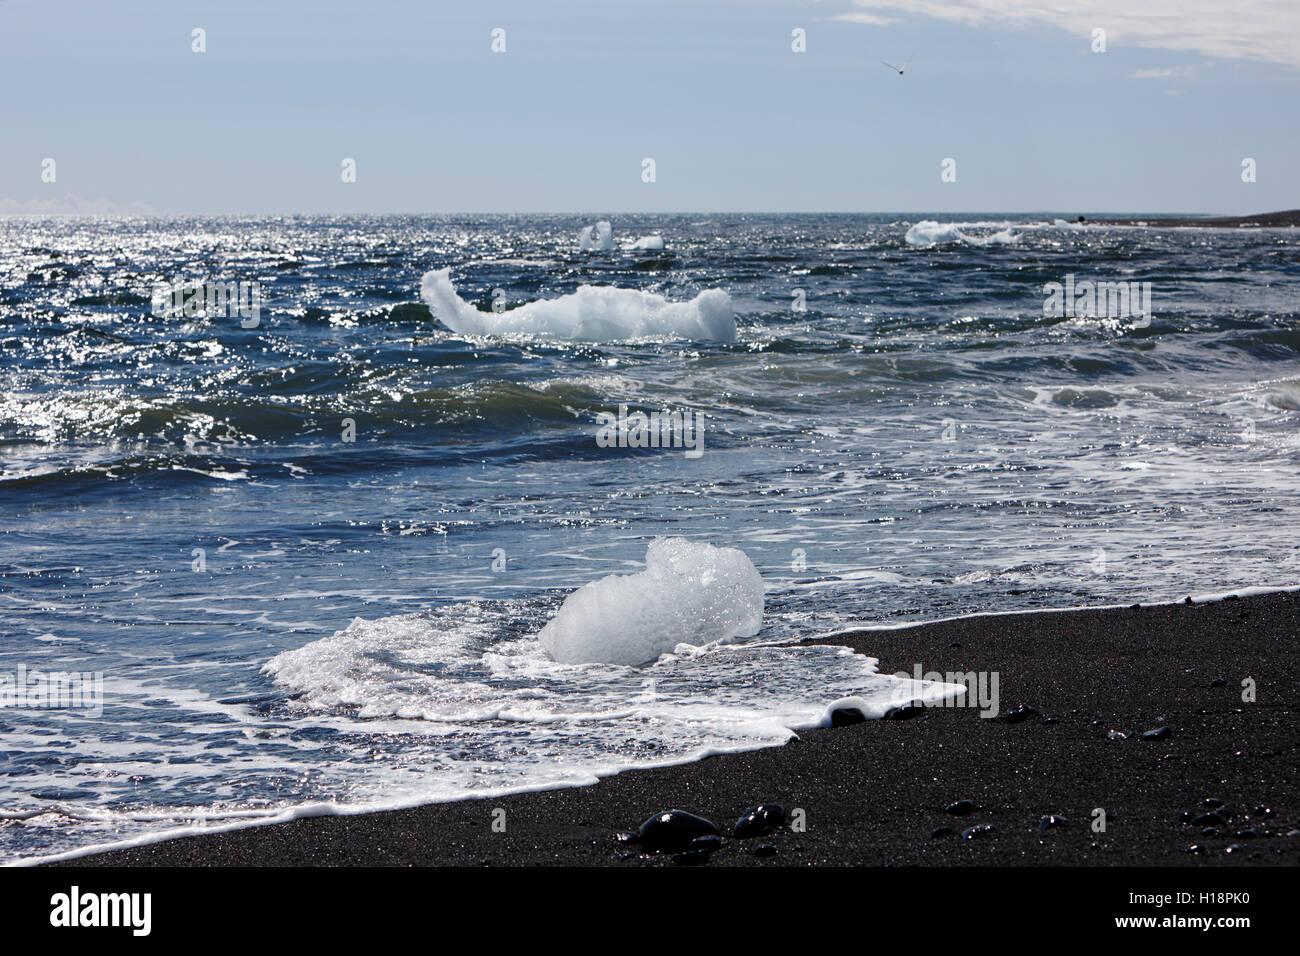 Icebergs washing up on black sand beach at jokulsarlon iceland Stock Photo